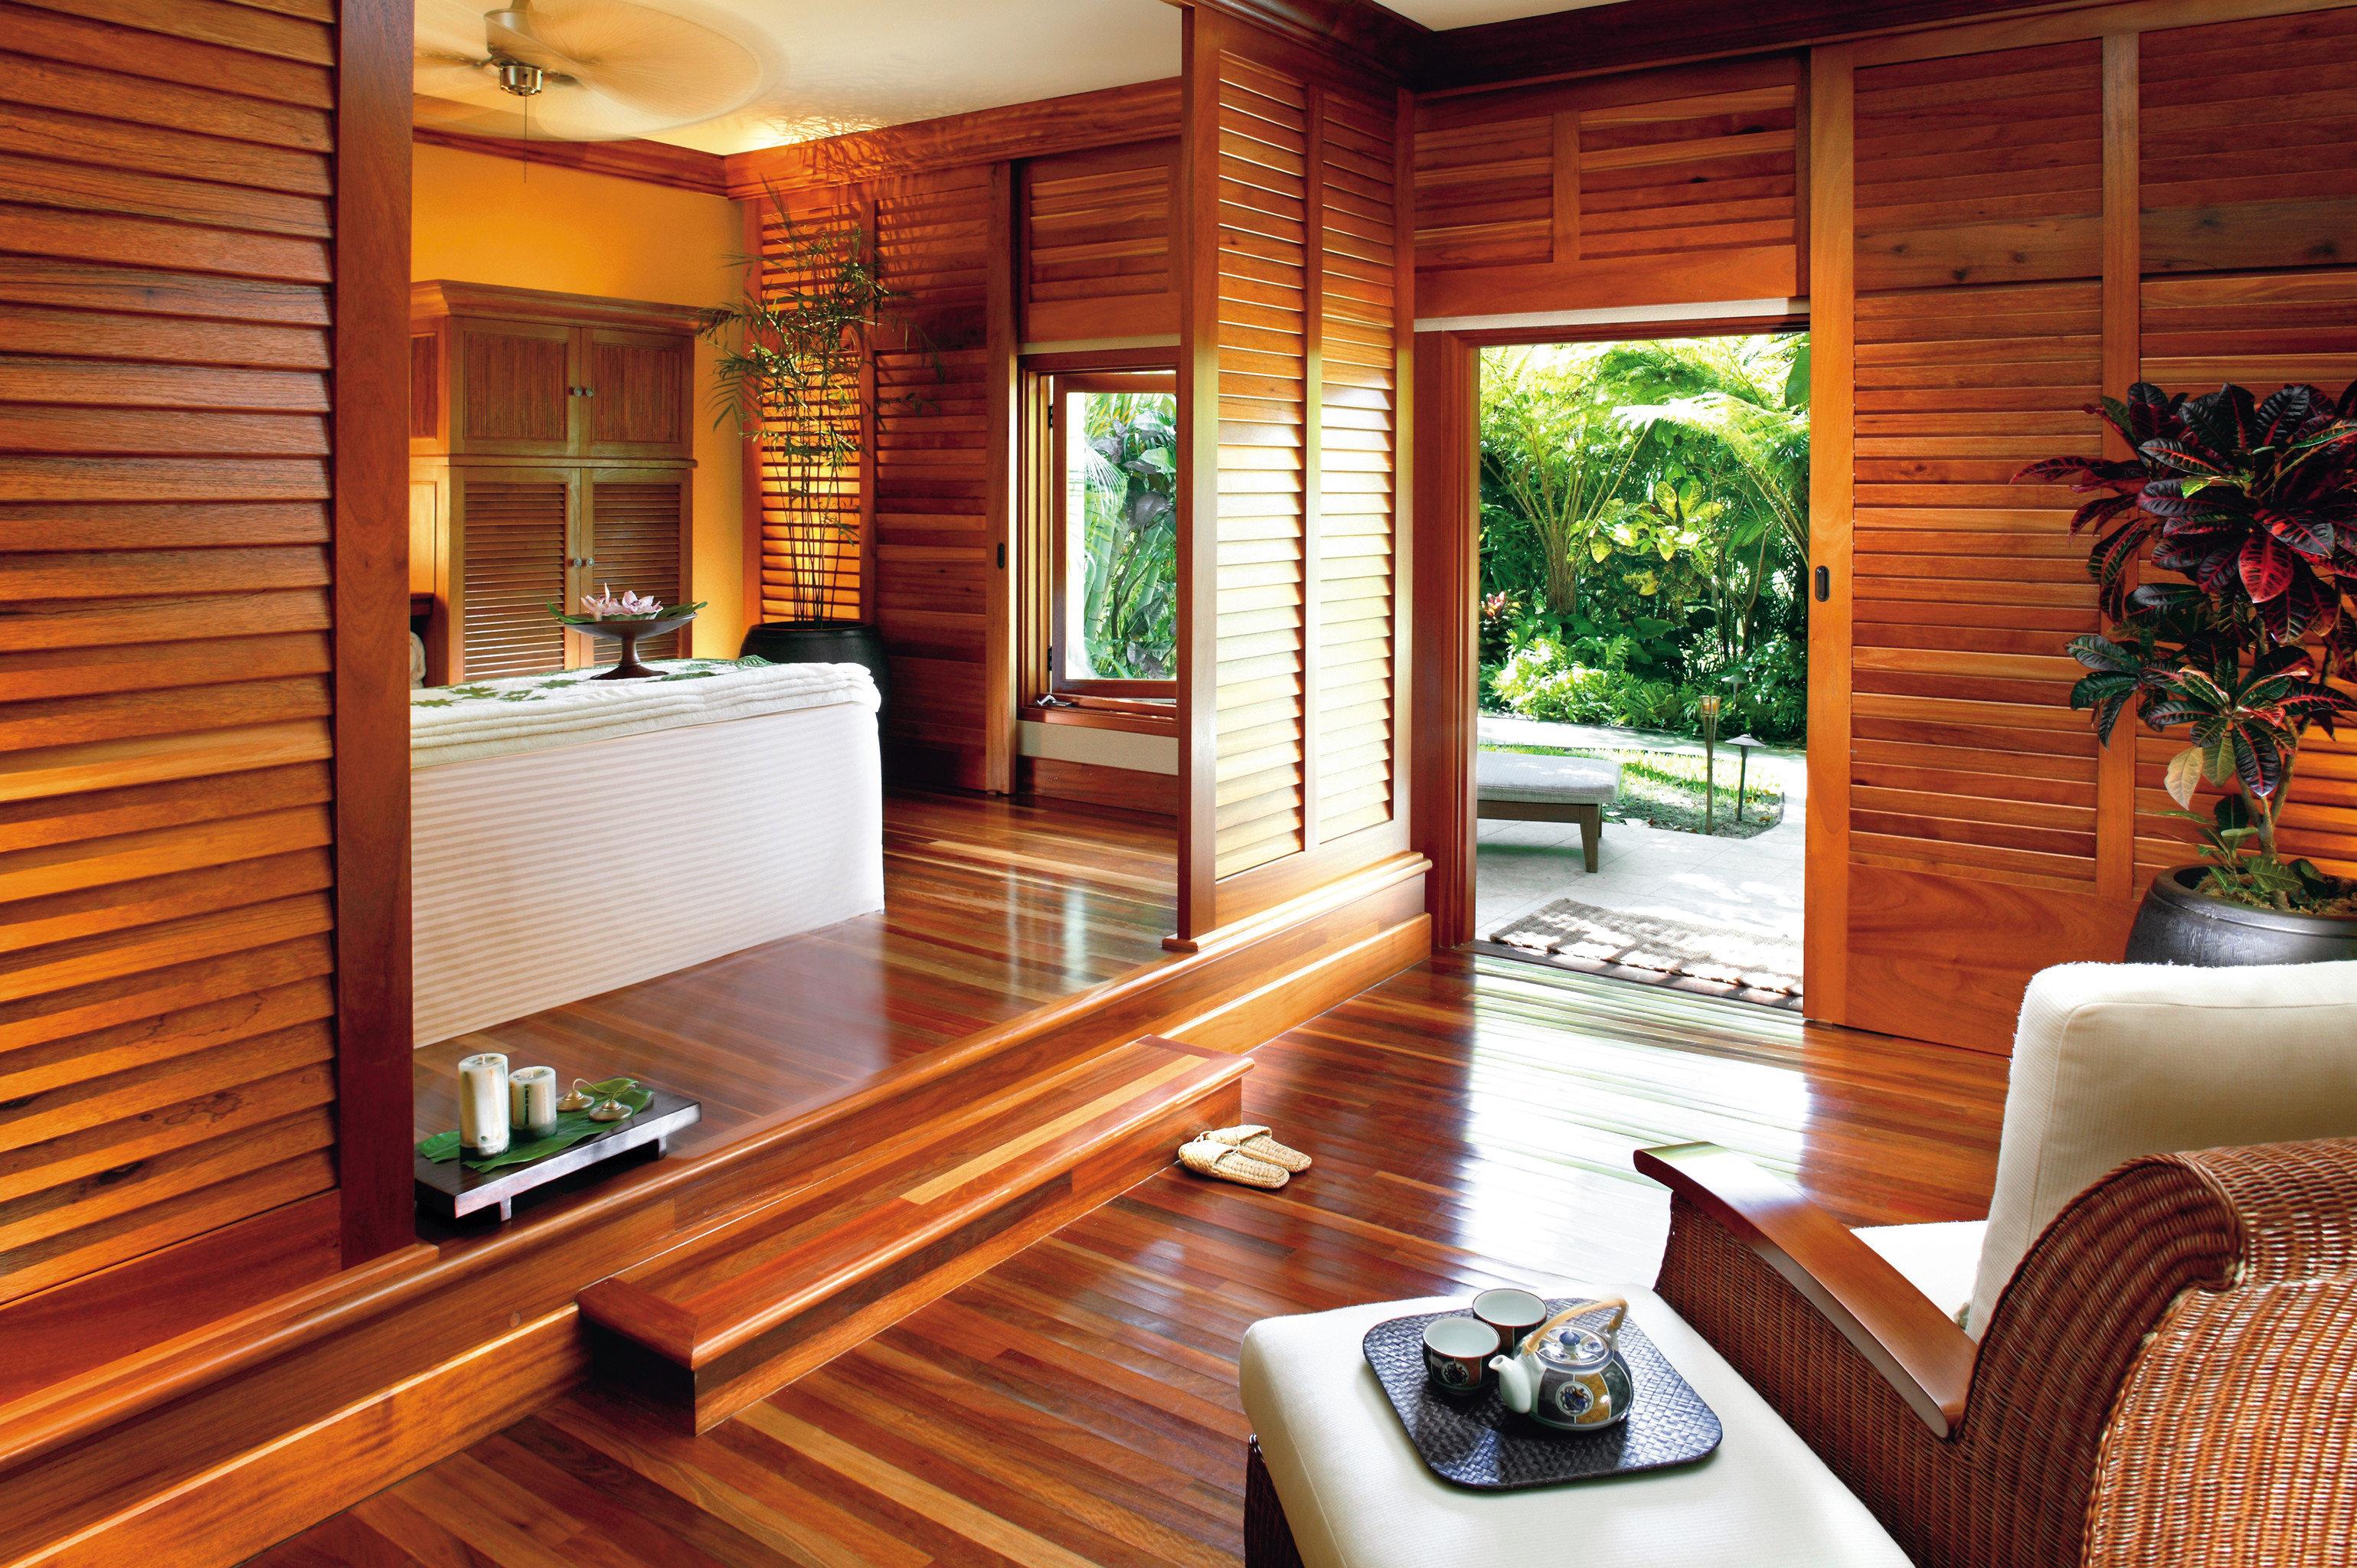 Beach Beachfront Family Honeymoon Island Resort Romance Romantic Spa Village Wellness property home hardwood living room Suite cottage wood flooring